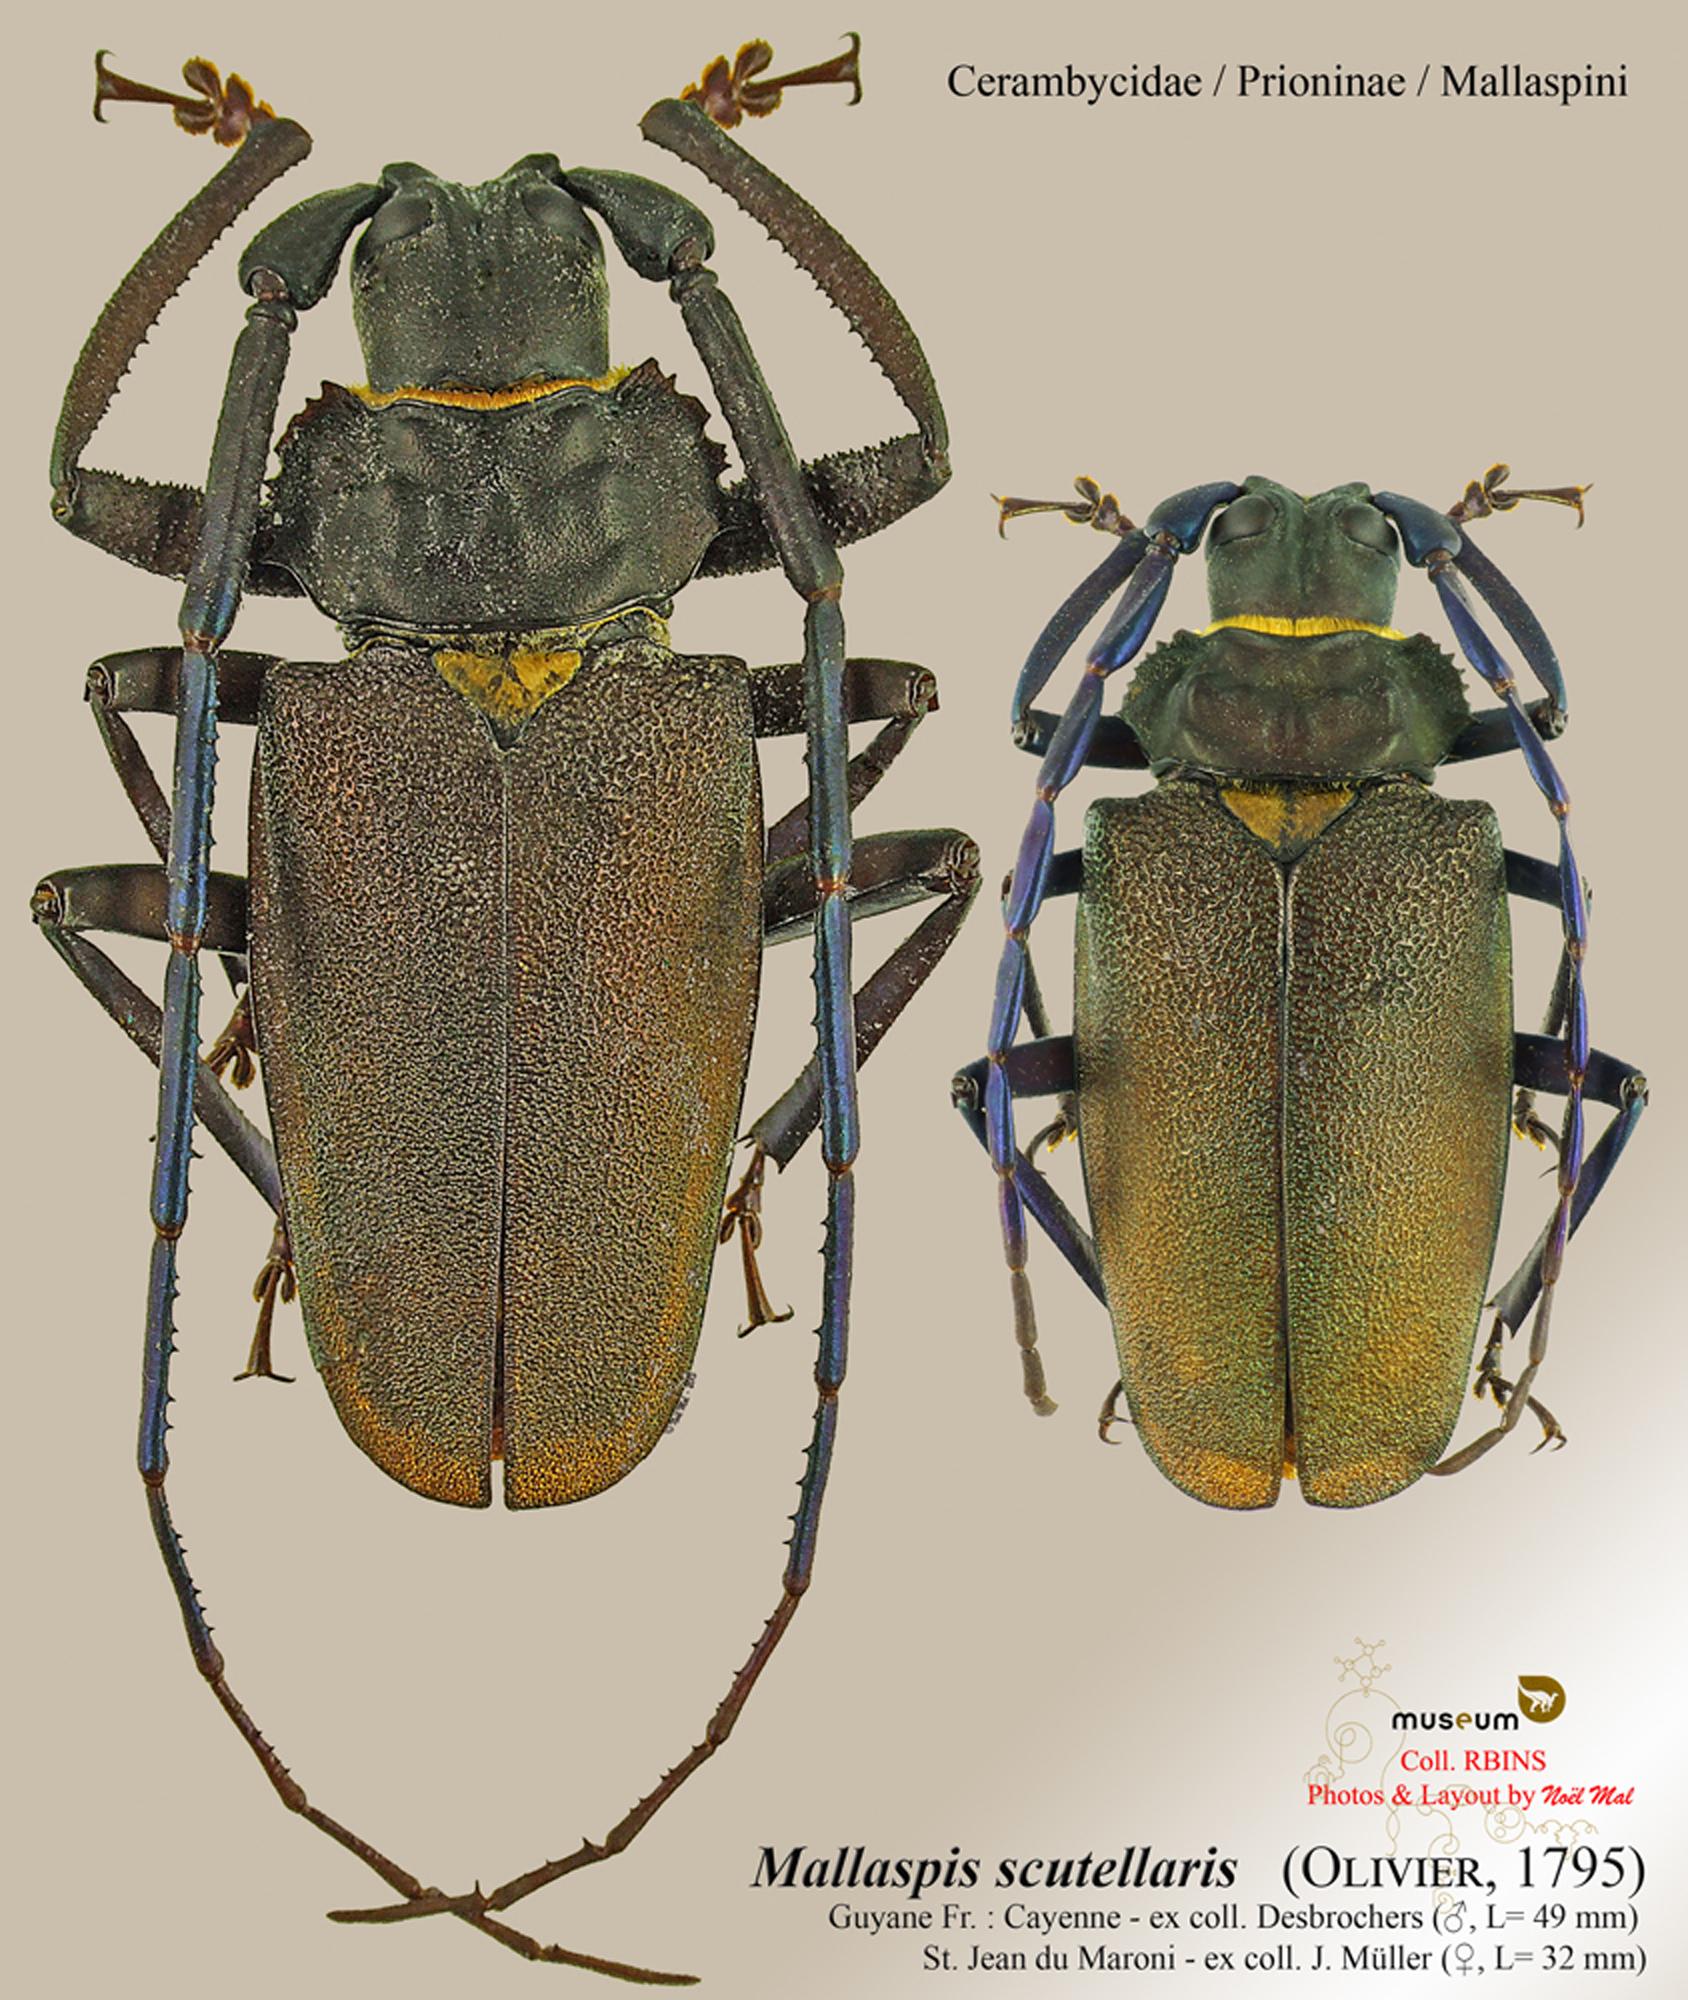 Mallaspis scutellaris.jpg